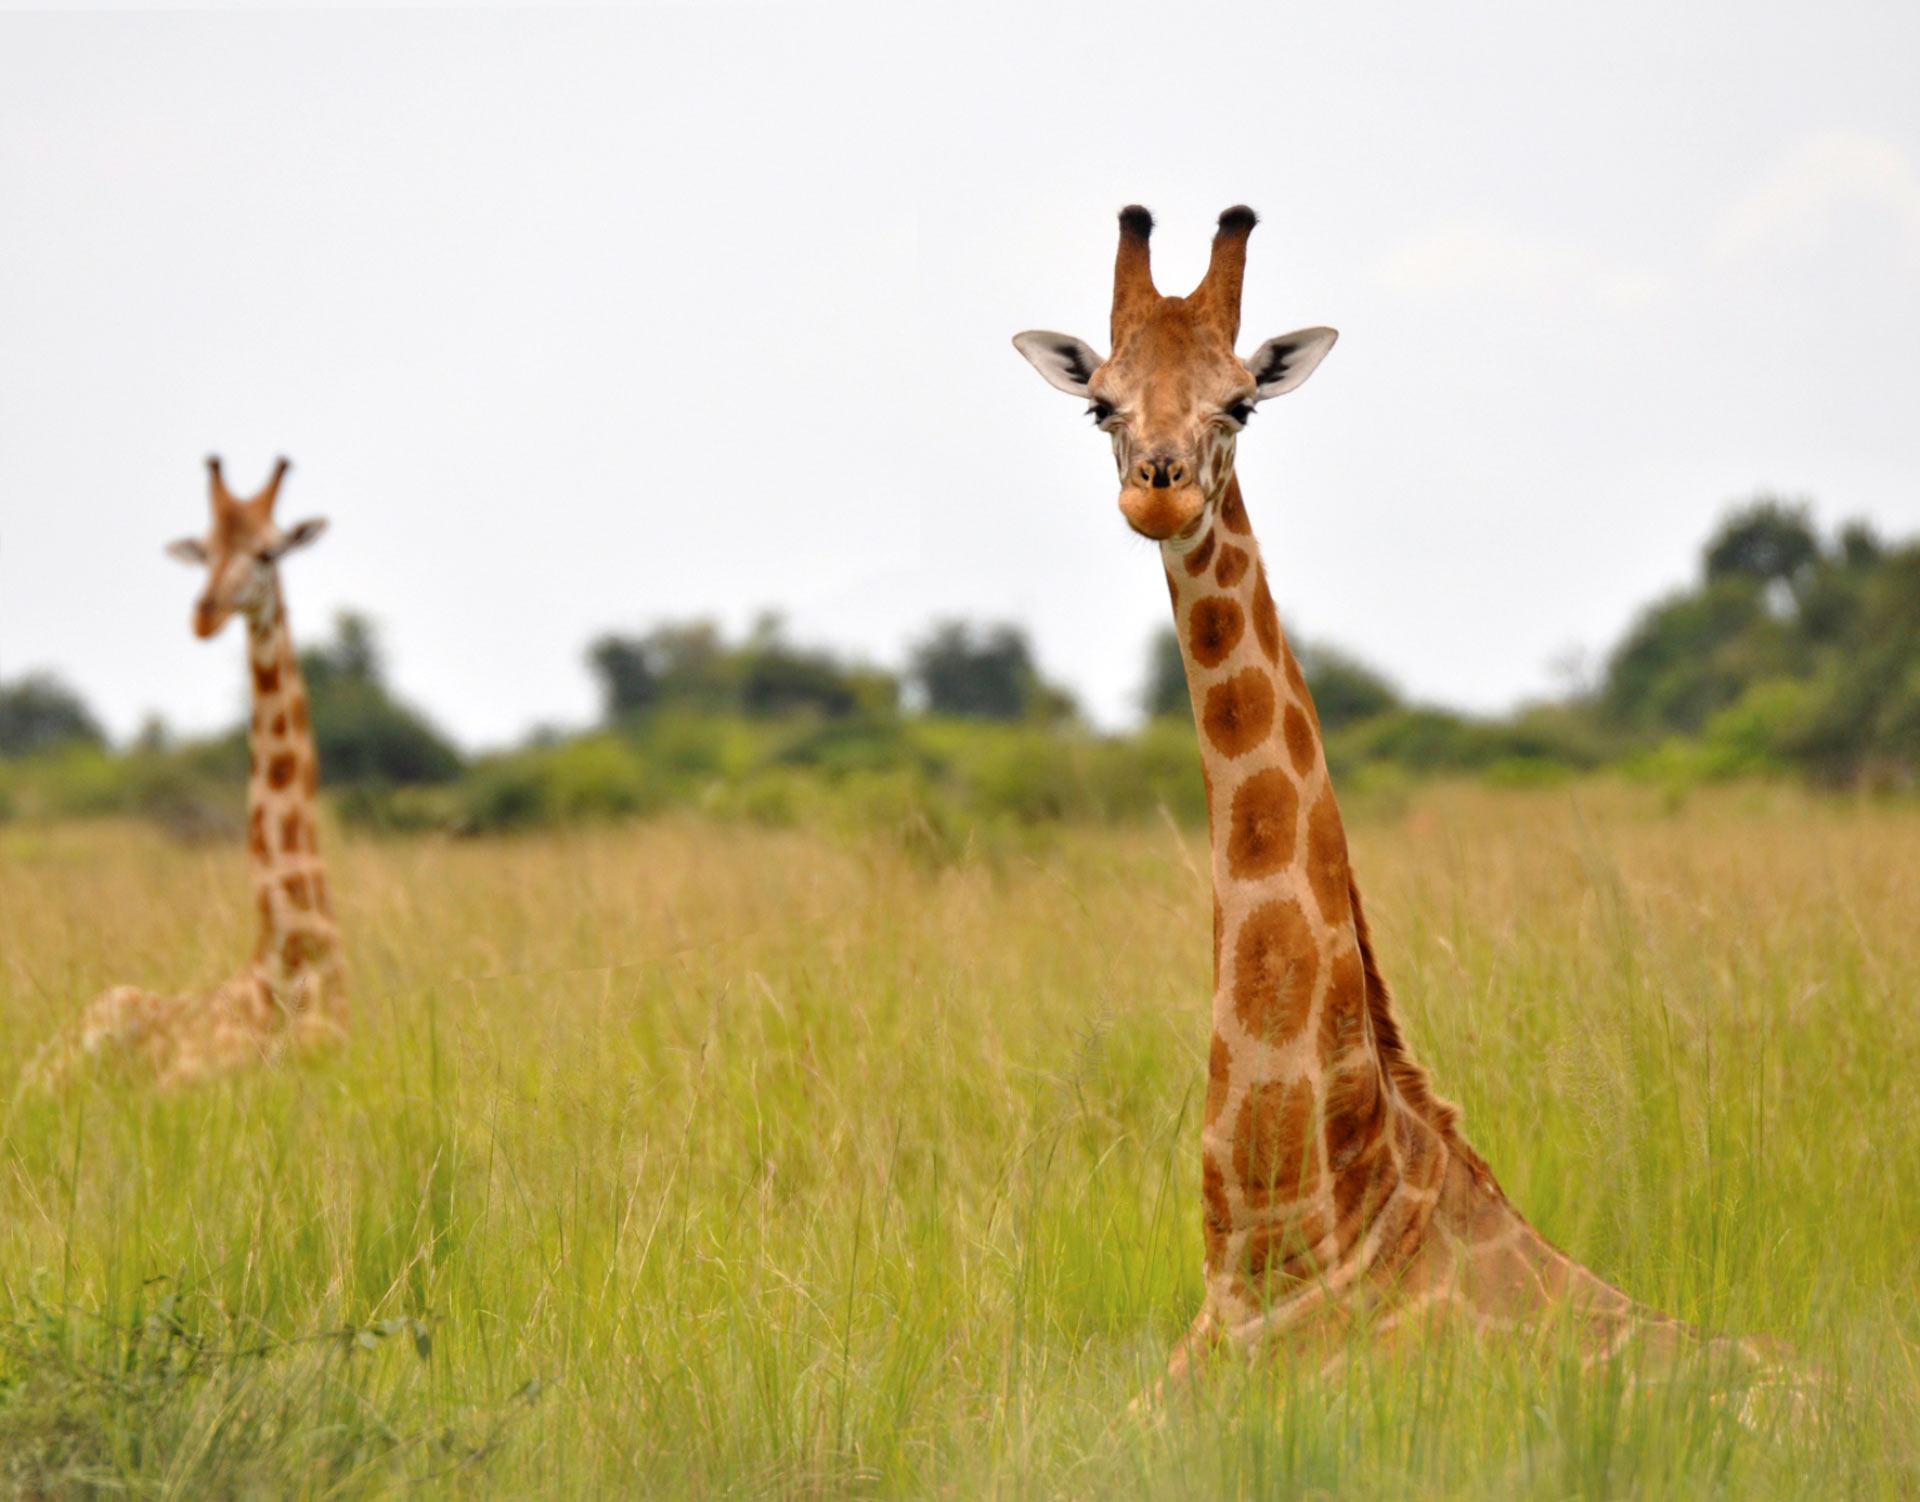 image_4179_3e-nubian-giraffe